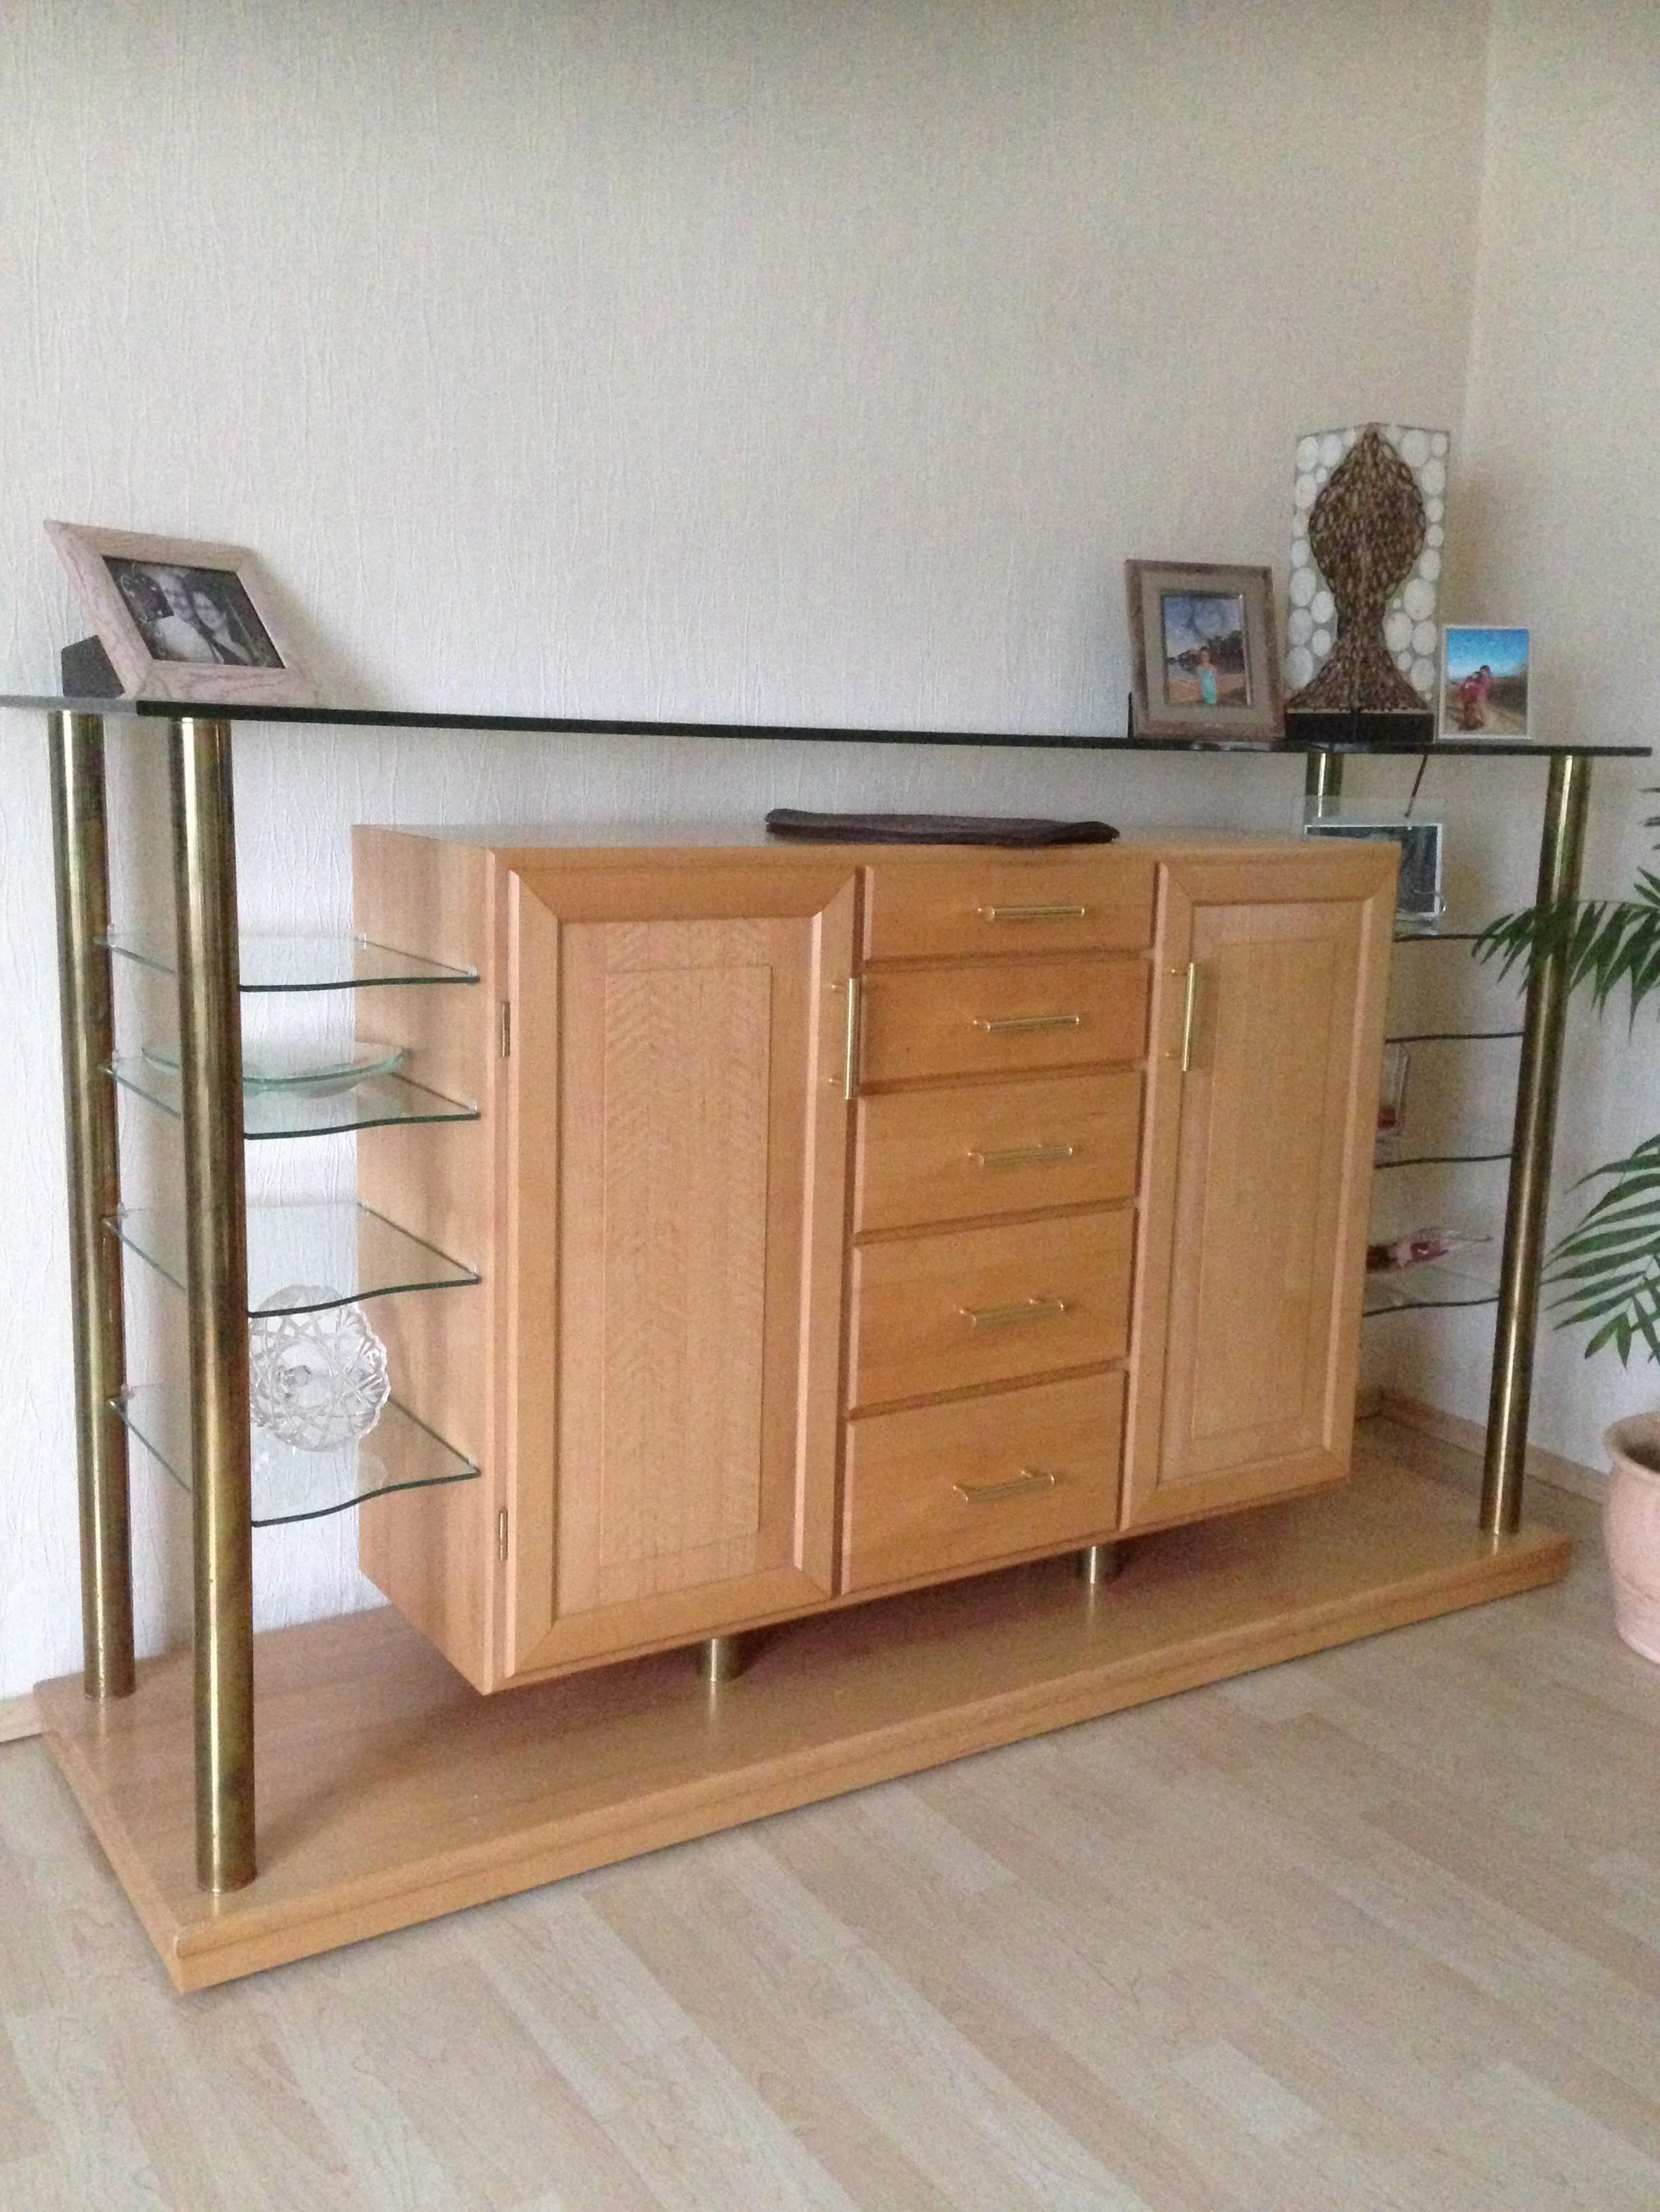 referenzen thomas herrmann. Black Bedroom Furniture Sets. Home Design Ideas